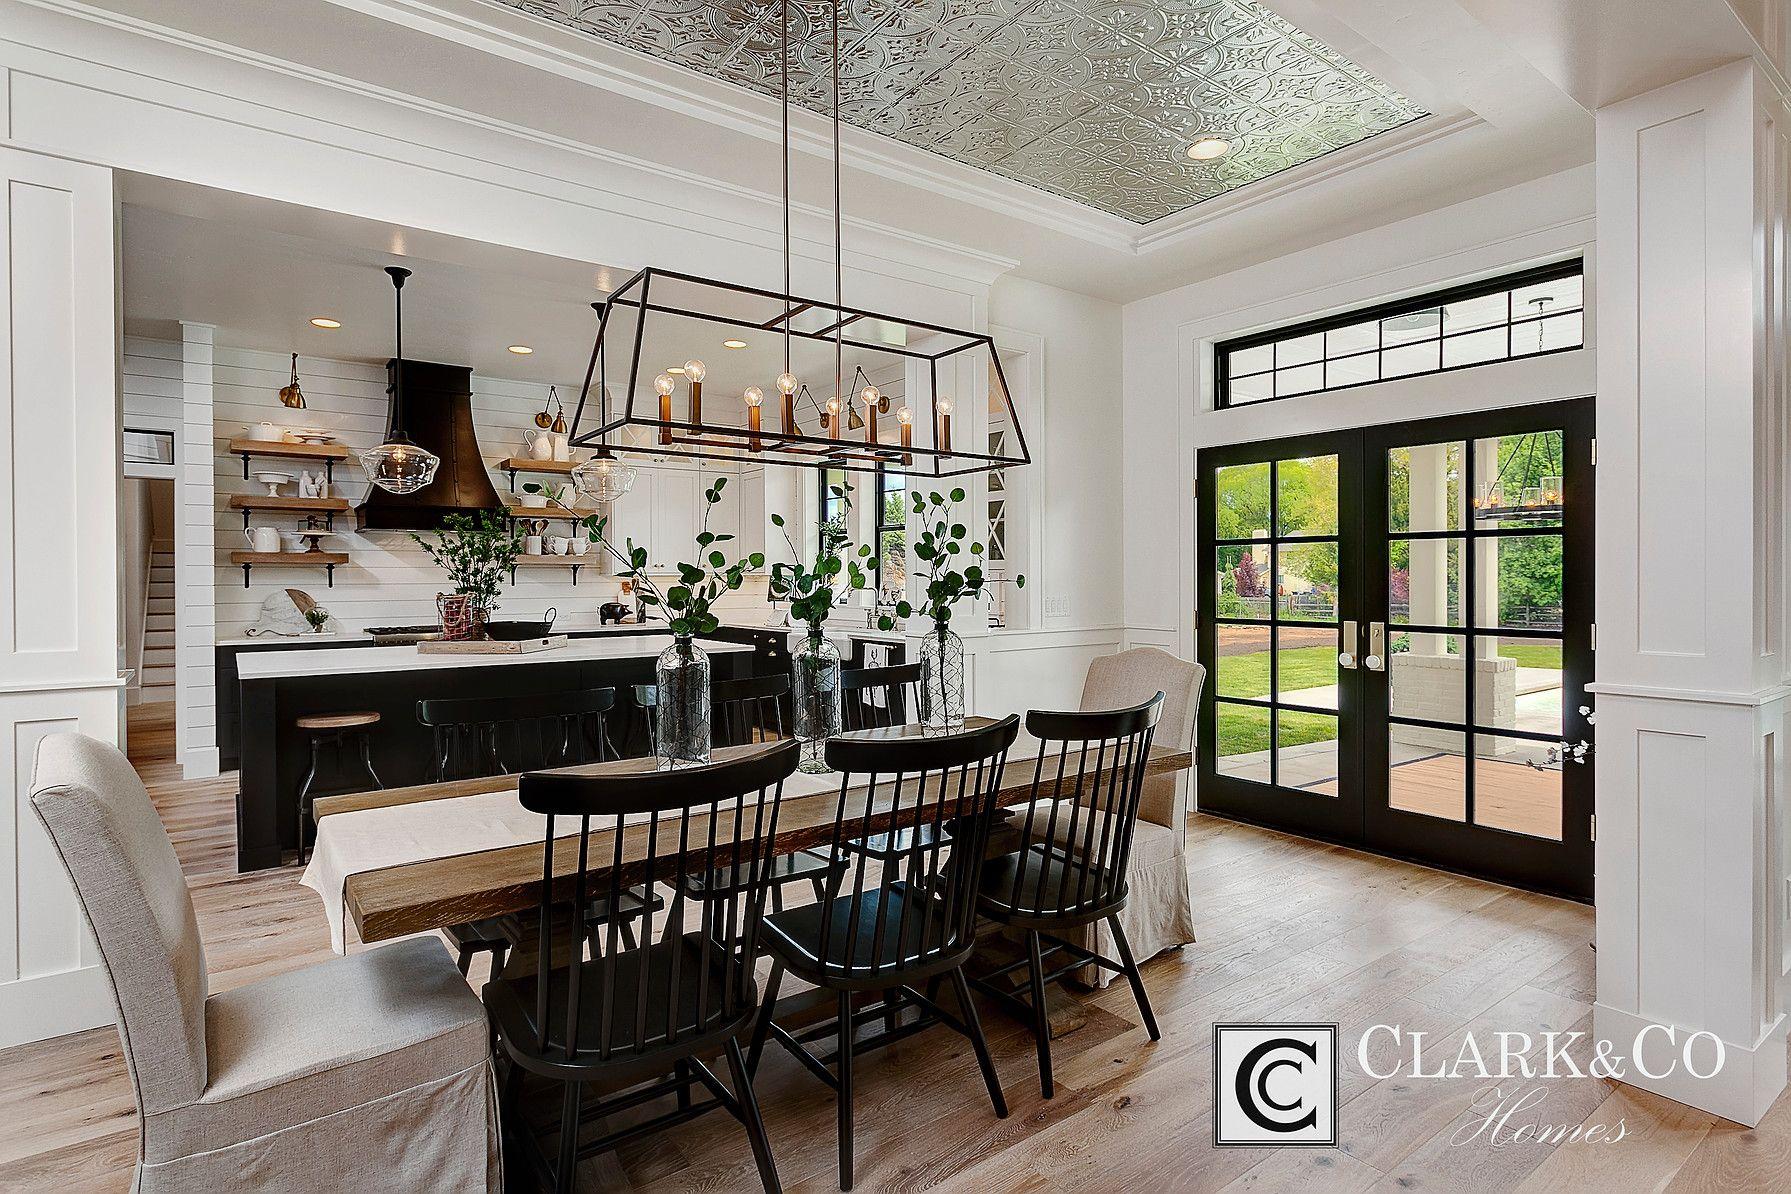 Clark & Co Homes 2016 Spring Model Home Modern farmhouse